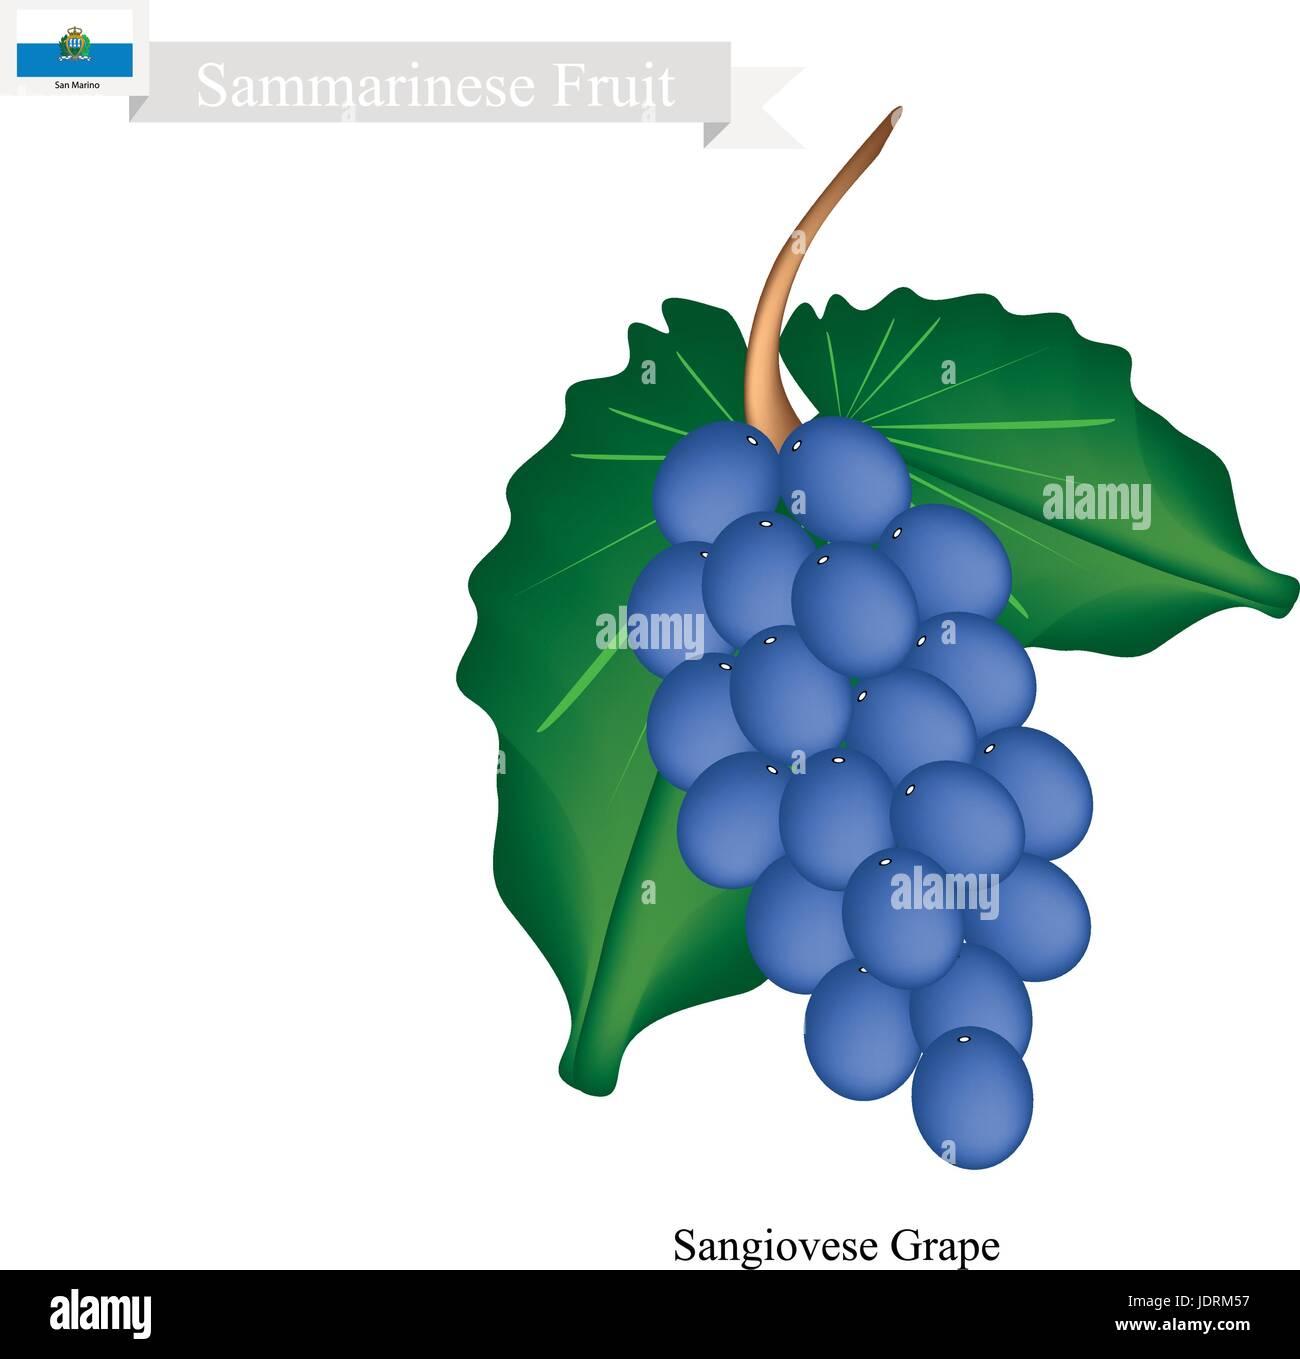 Yemen Fruit, Ripe and Sweet Grape. One of The Most Popular Fruits of Yemen. - Stock Vector